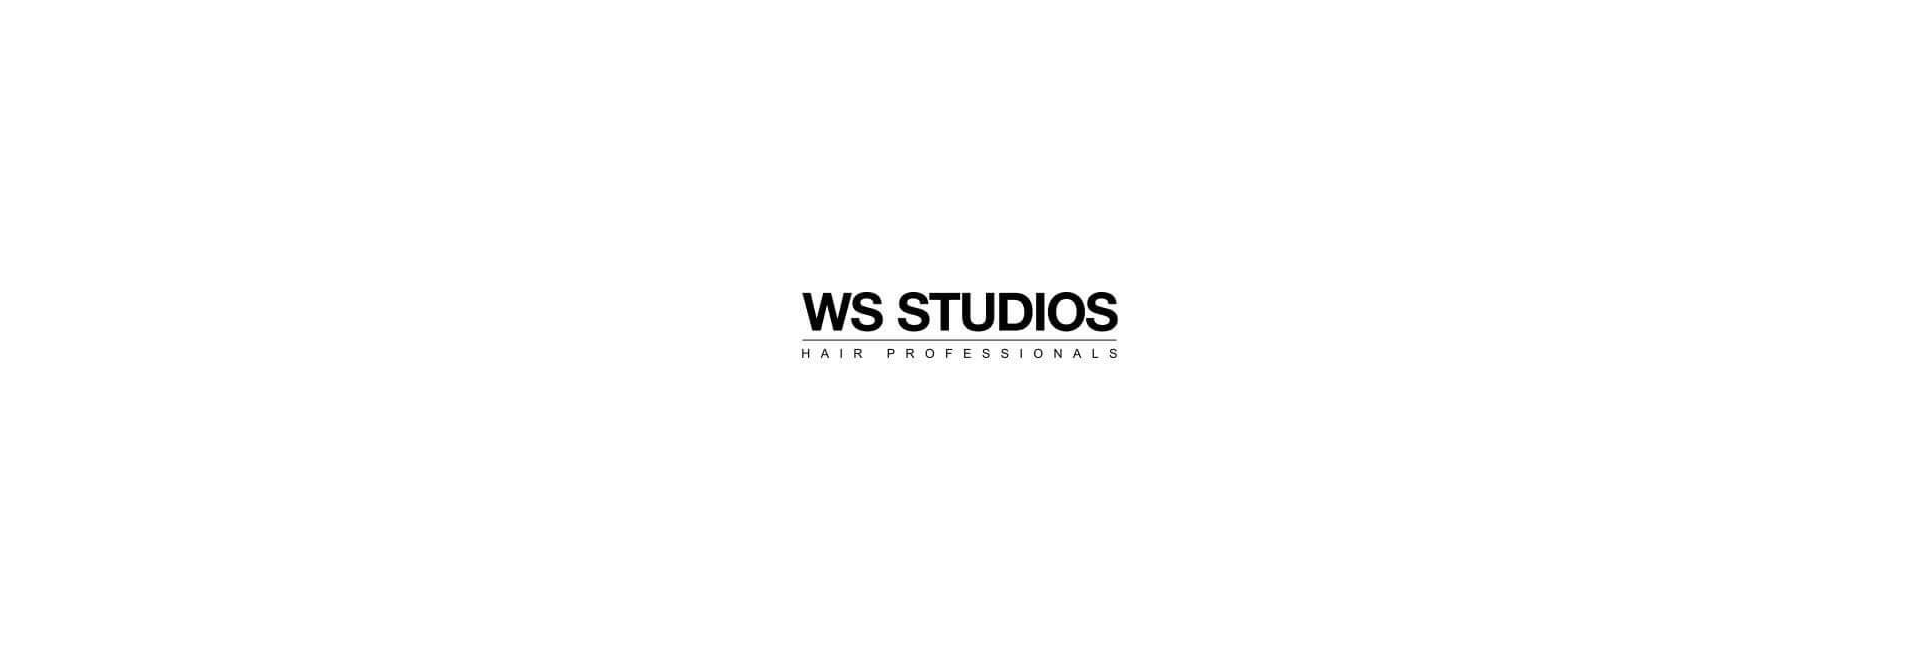 ws studios